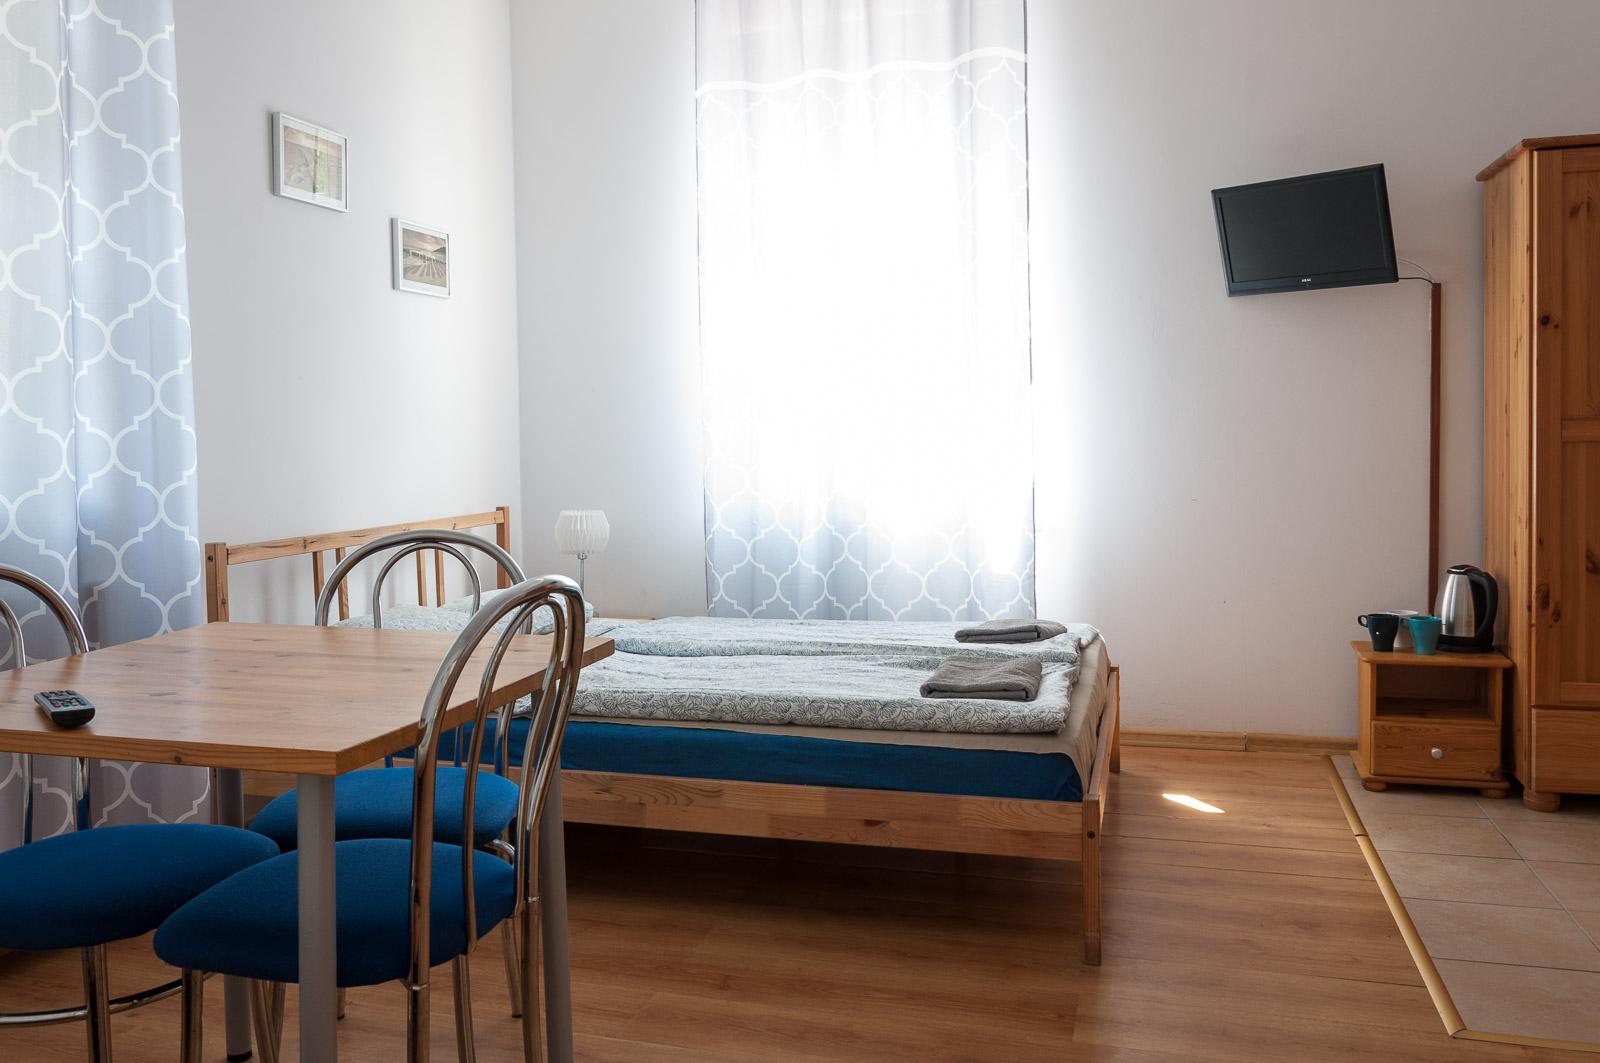 pokoje-na-wynajem-gdansk-jelitkowo_zlota-plaza_zp06_ad022839